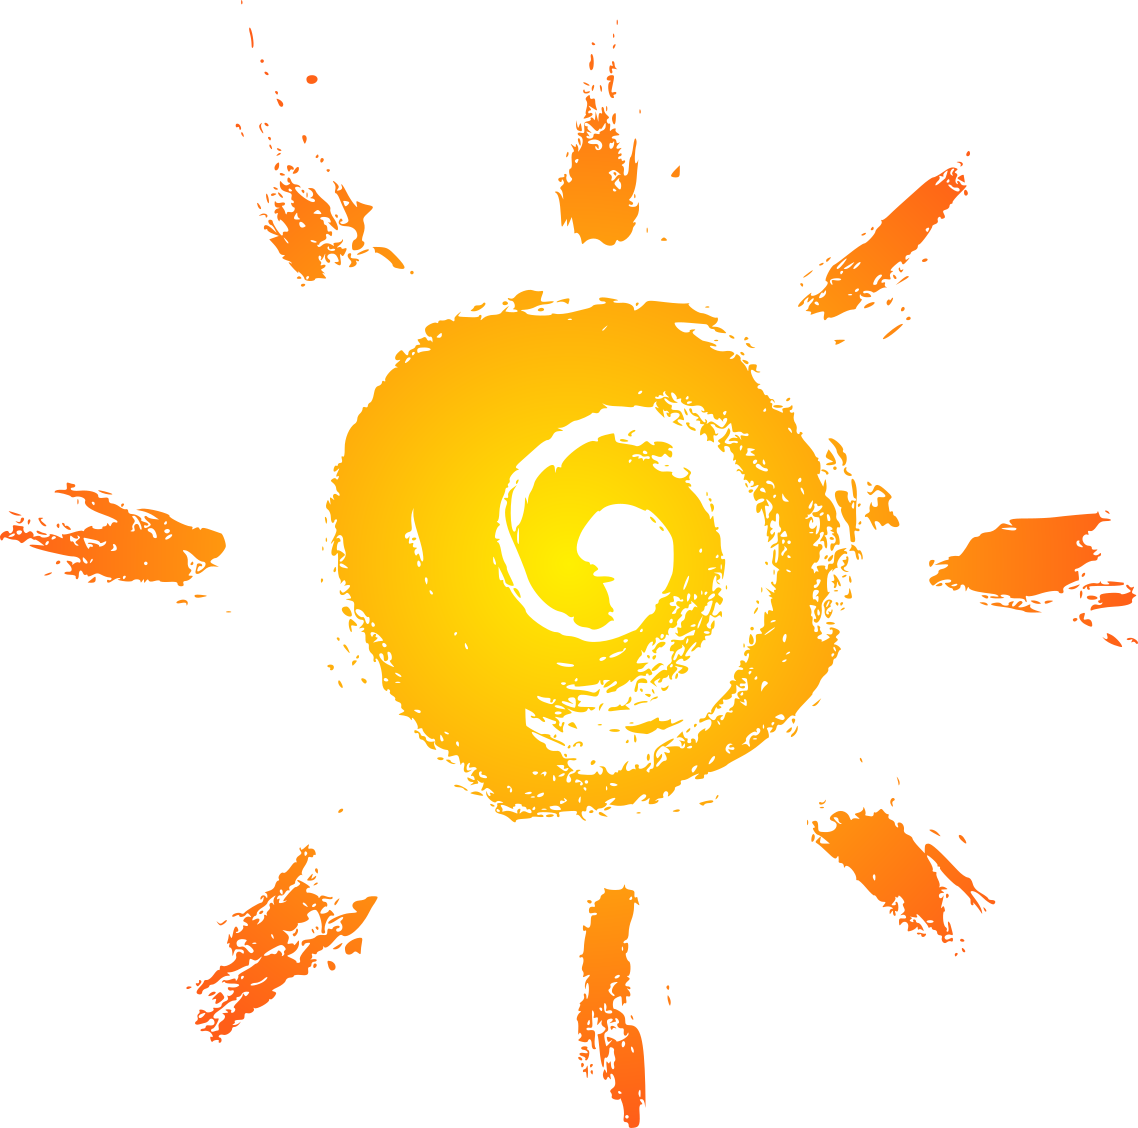 grunge-sun-4.png